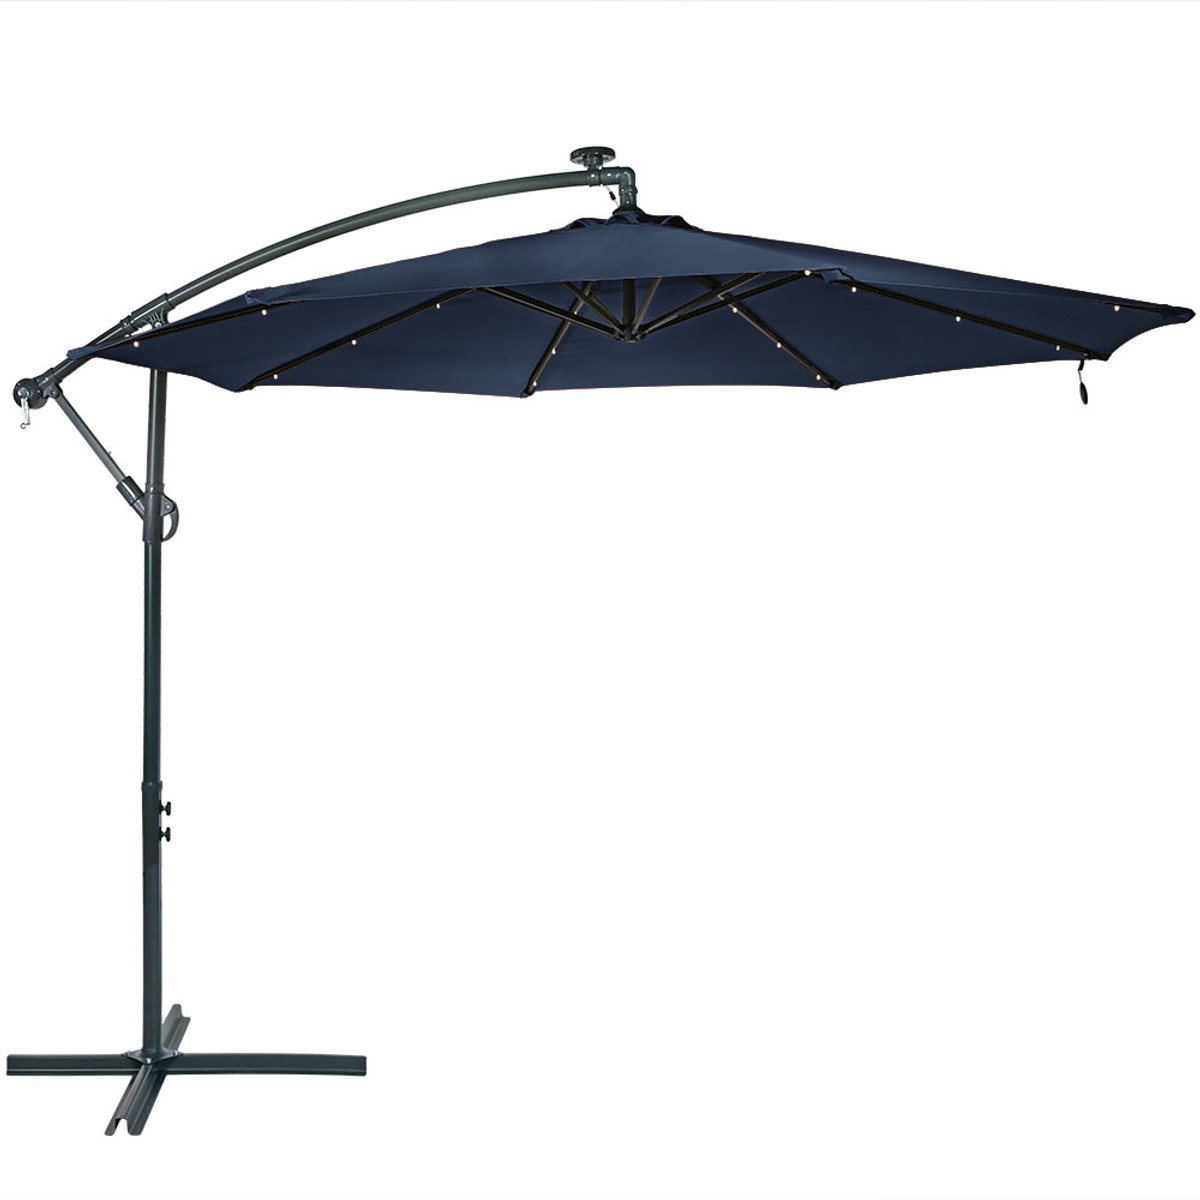 Your Cart  sc 1 st  Serenity Health \u0026 Home Decor & Sunnydaze Steel 10-Foot Offset Solar LED Patio Umbrella